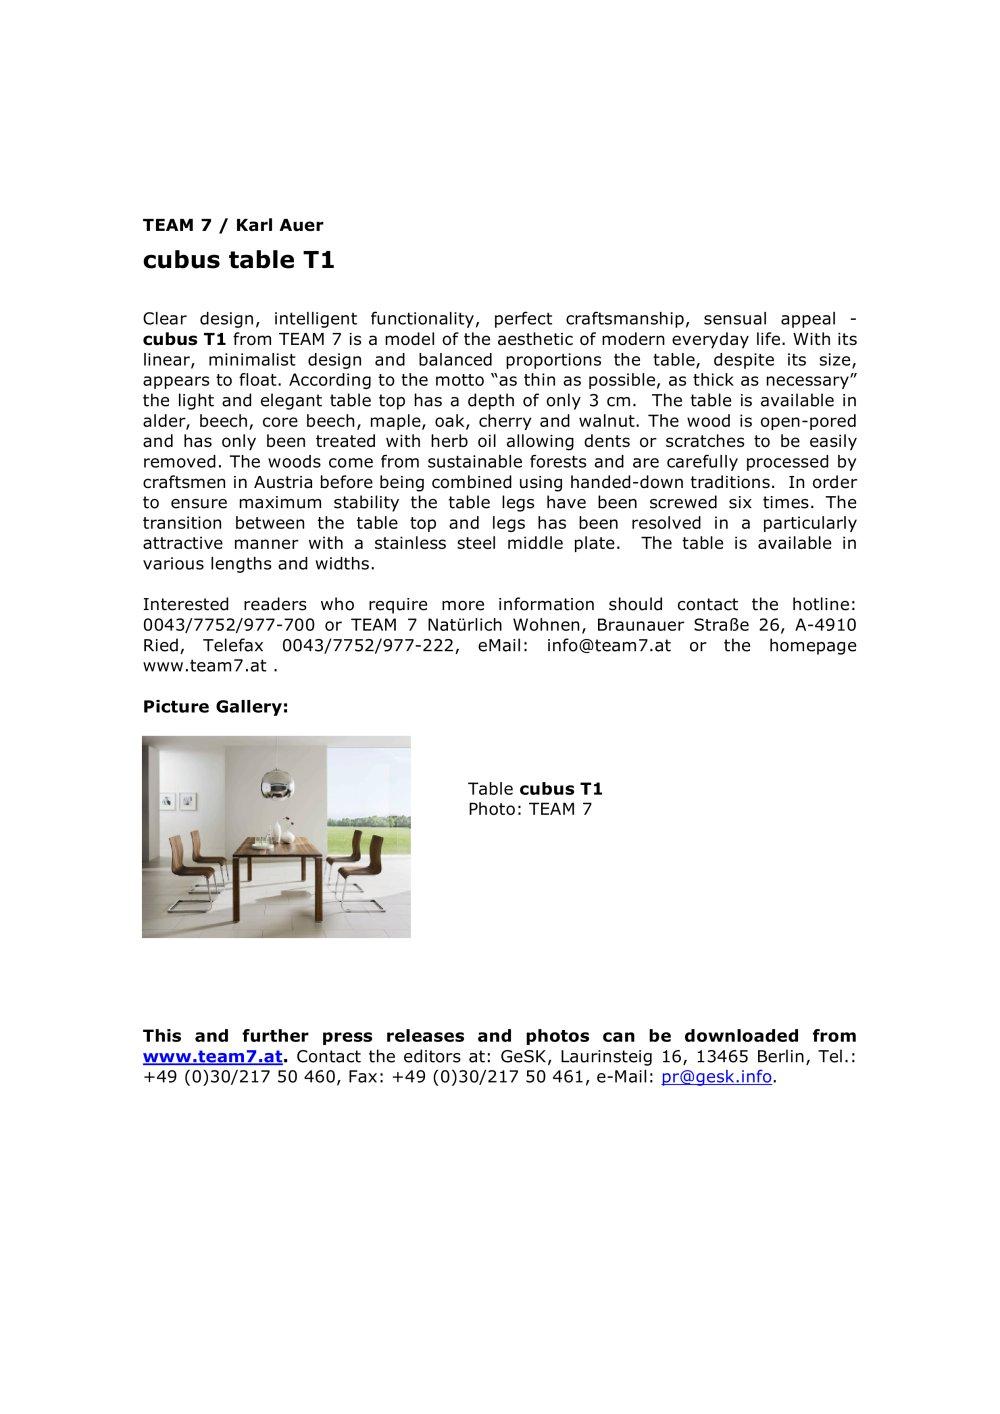 Cubus Berlin cubus table t1 team 7 pdf catalogues documentation brochures